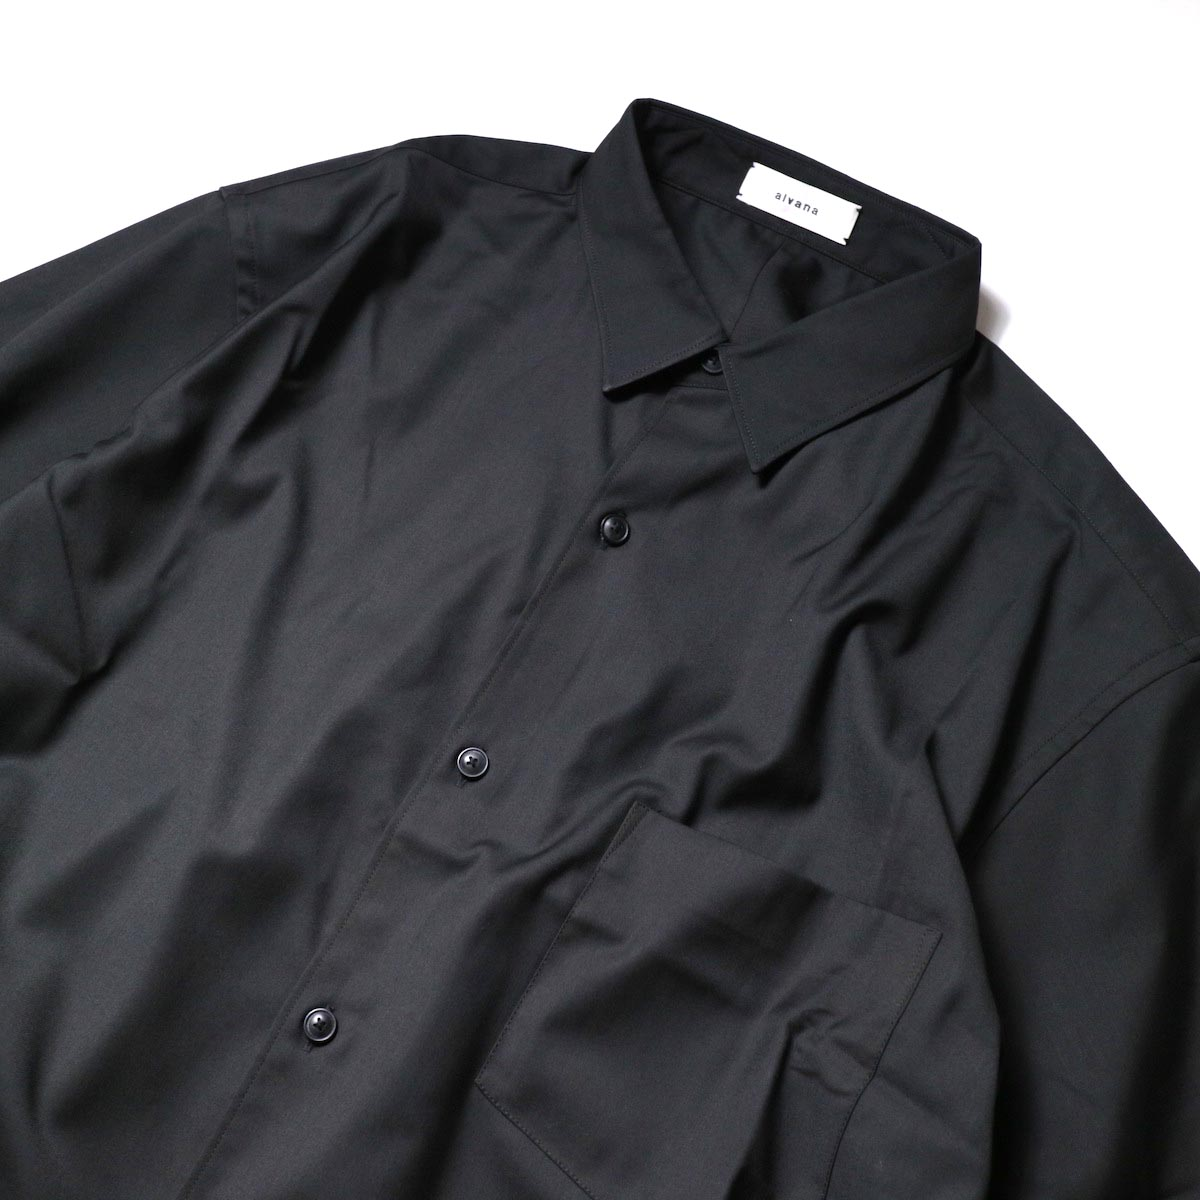 alvana / Wrinkle Proof Shirts (Black)襟